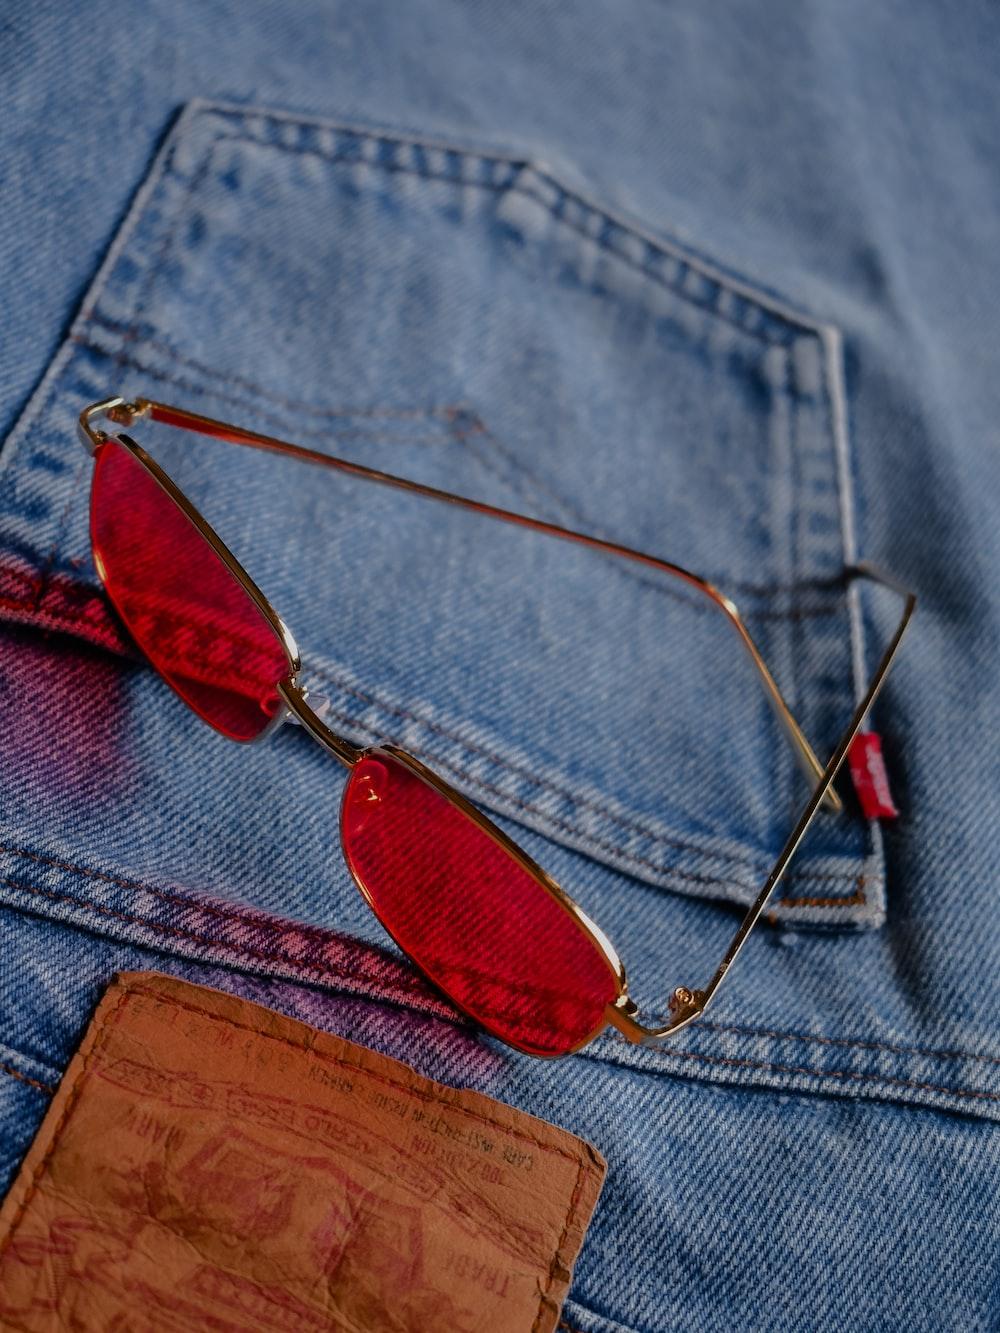 silver framed sunglasses on blue denim textile